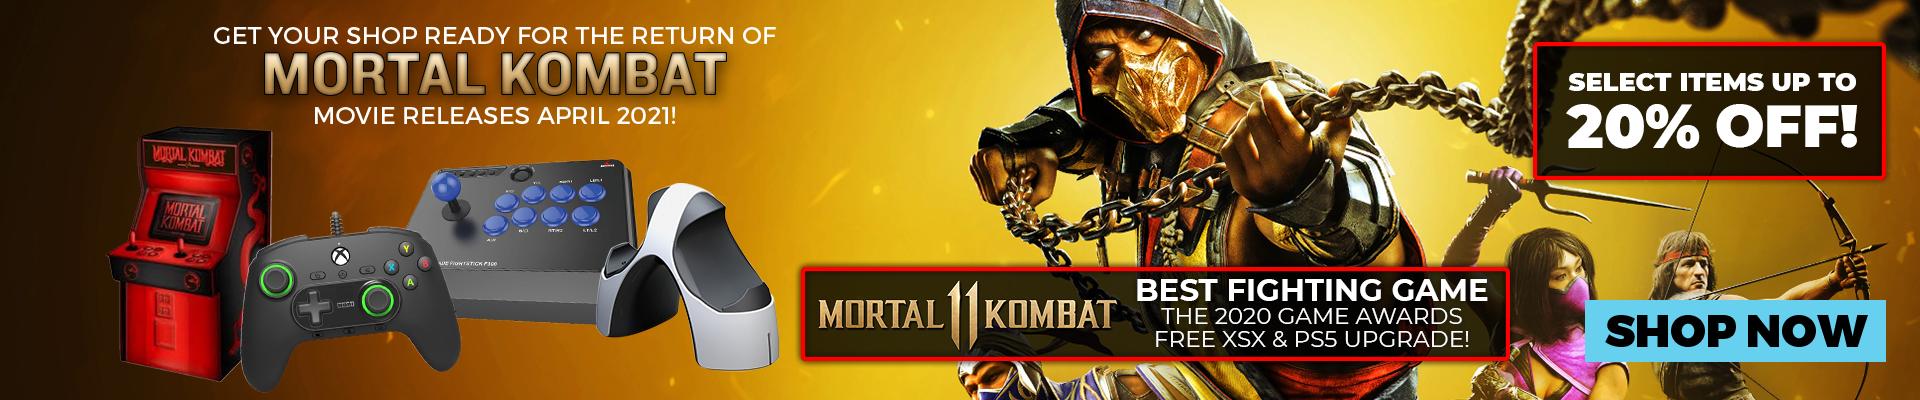 Mortal Kombat Sales Promo